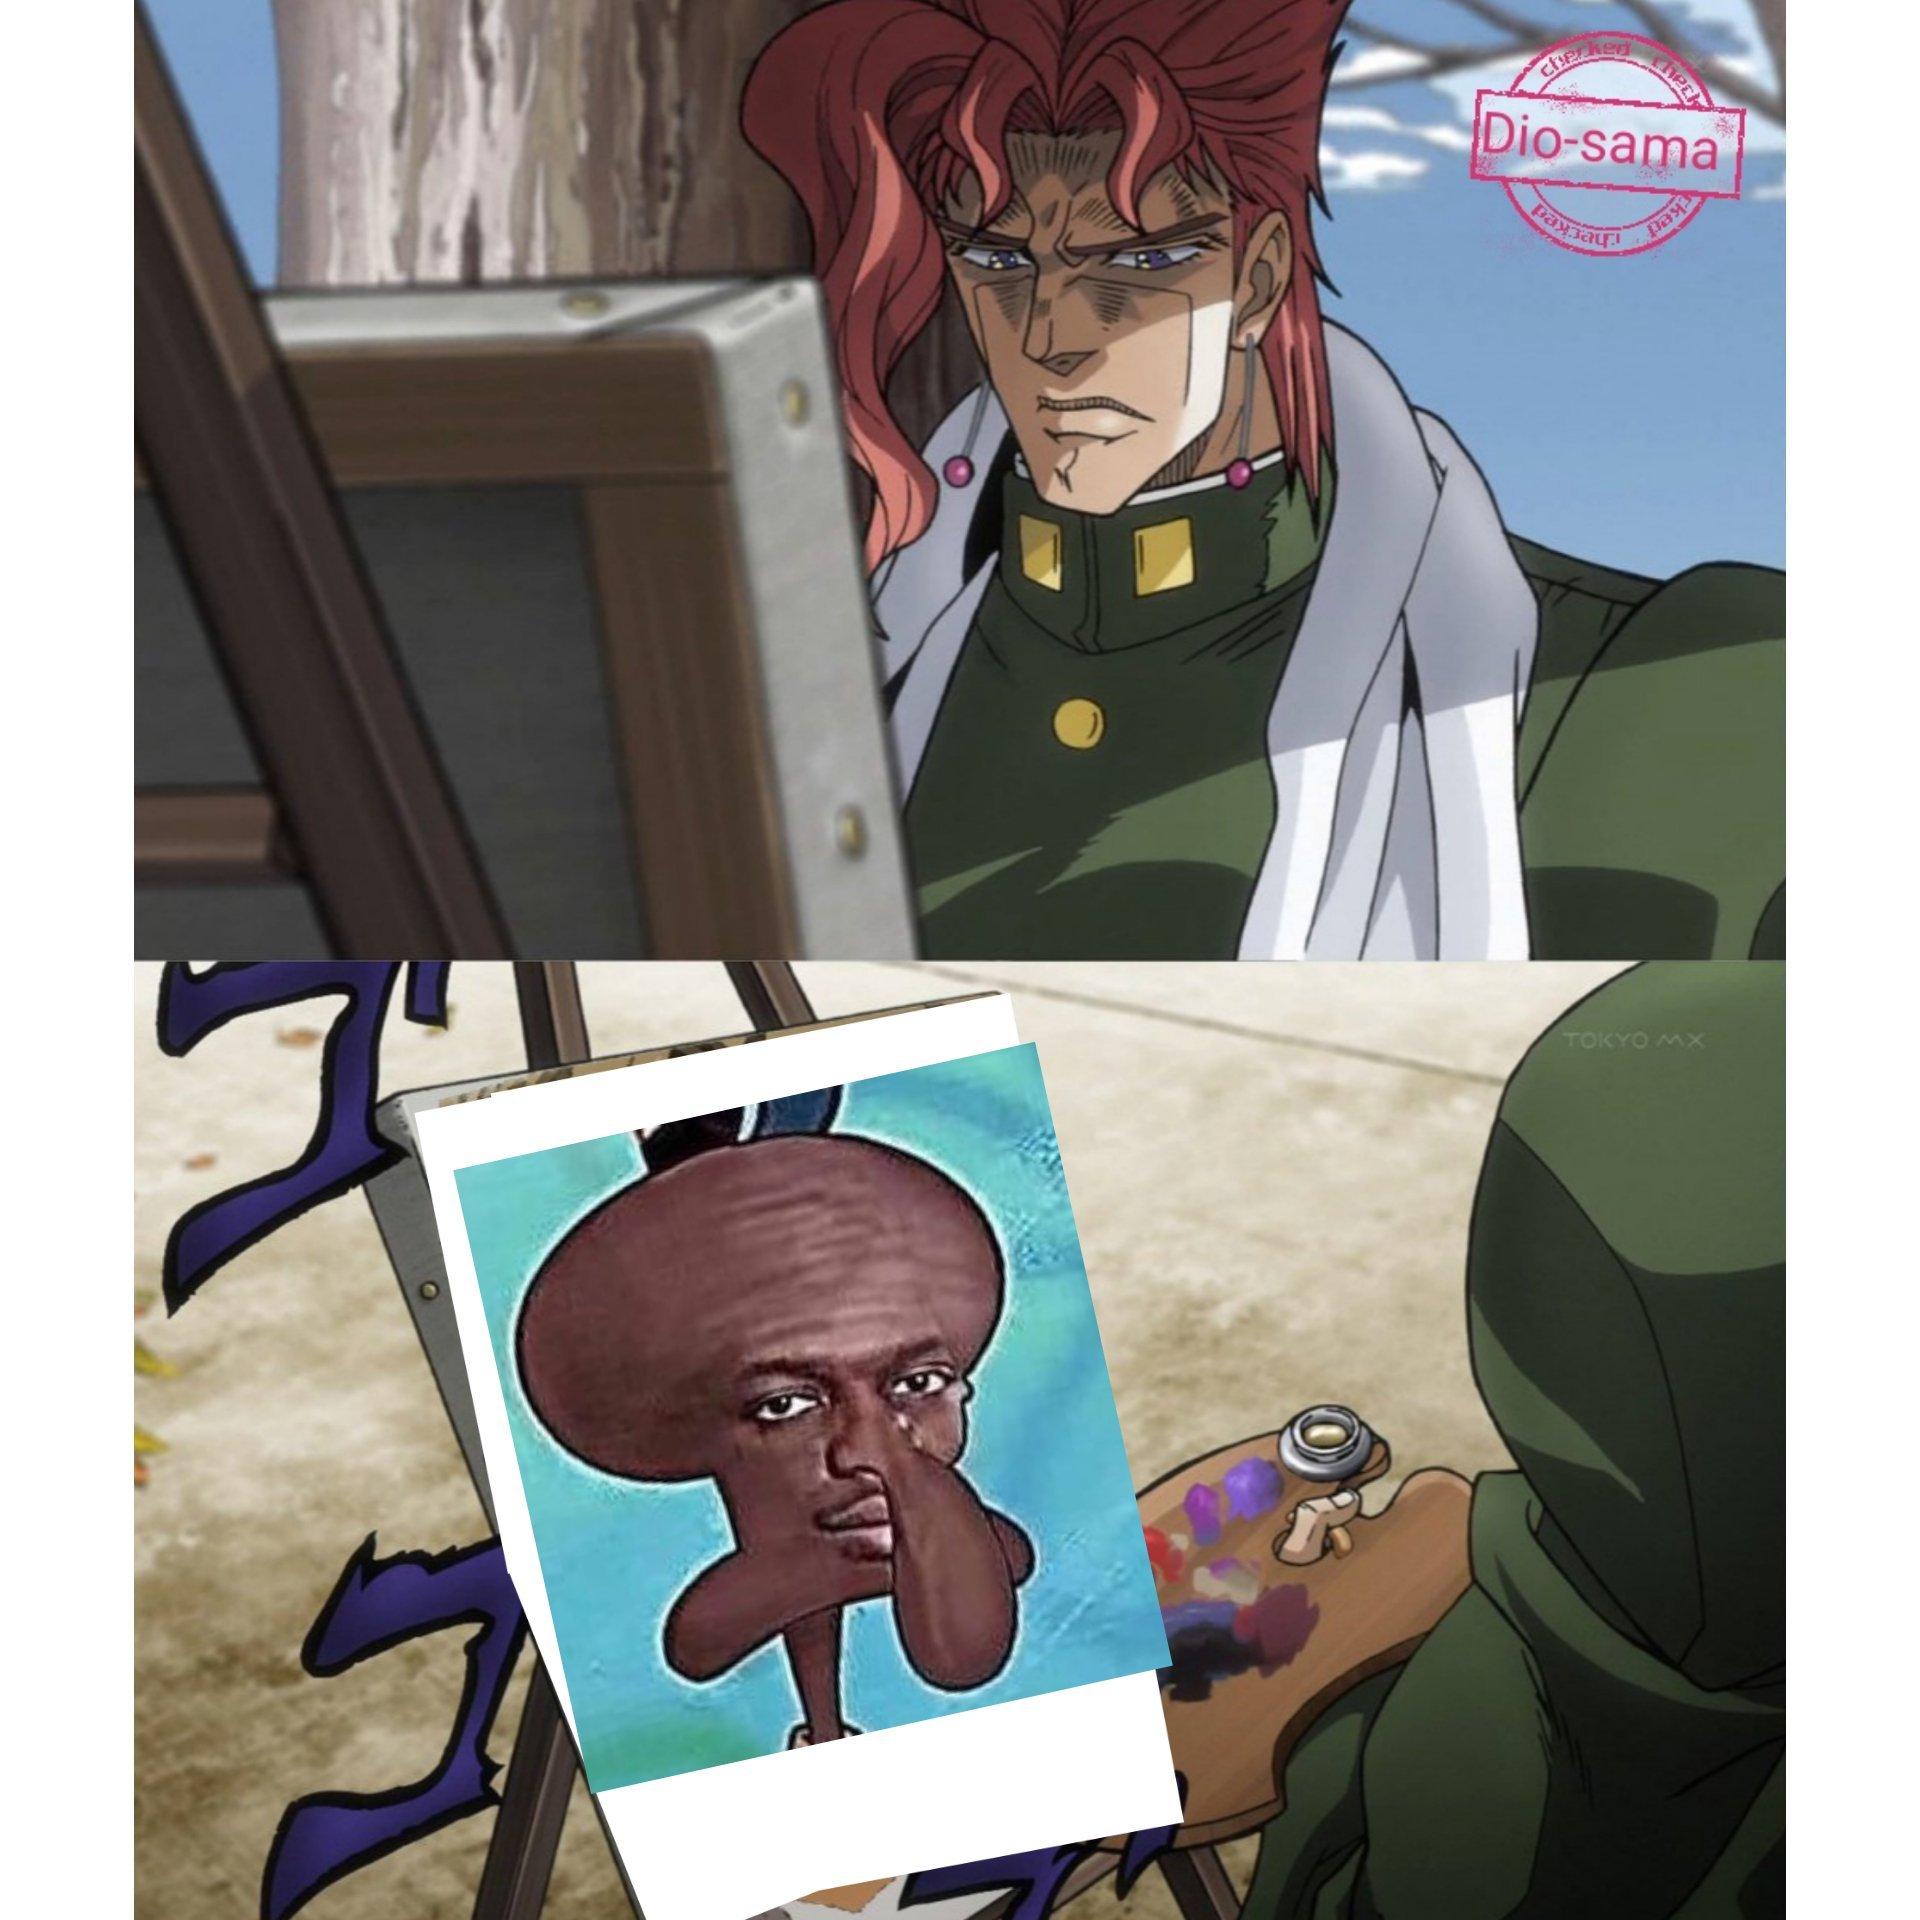 Todo un kpo el kakyokin - meme